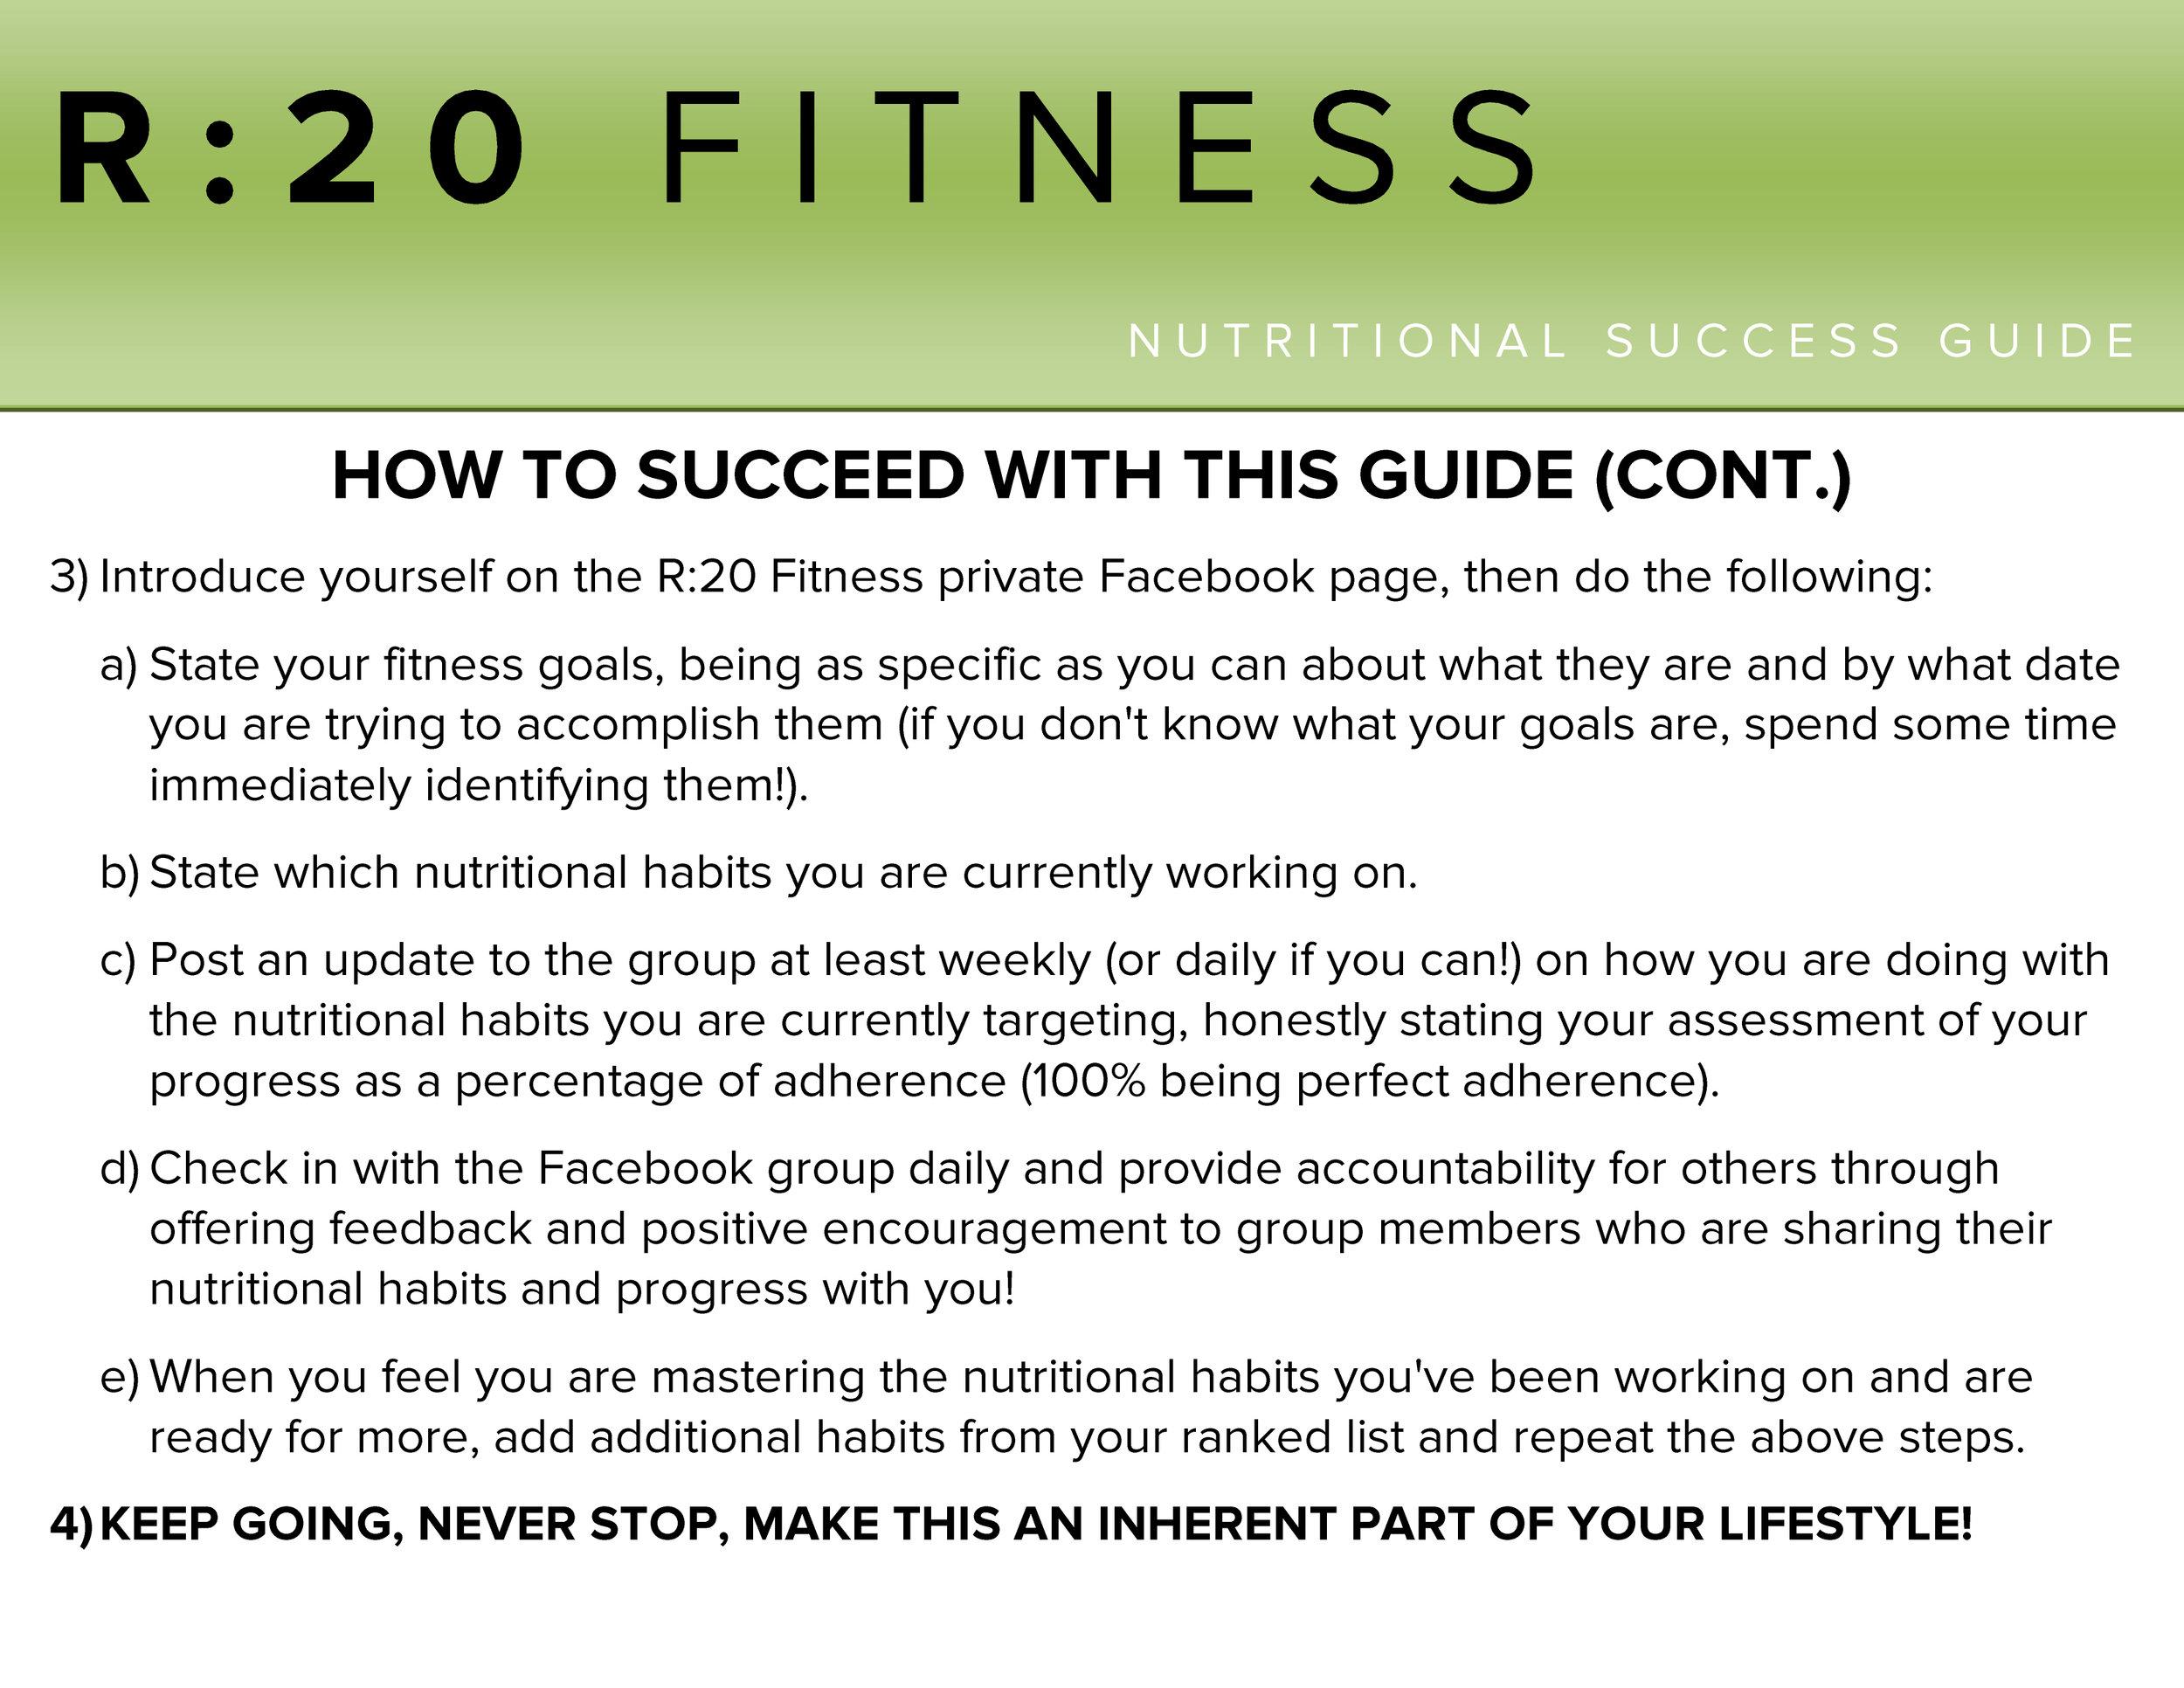 R20 1.0 Nutritional Success Guide-6.jpg